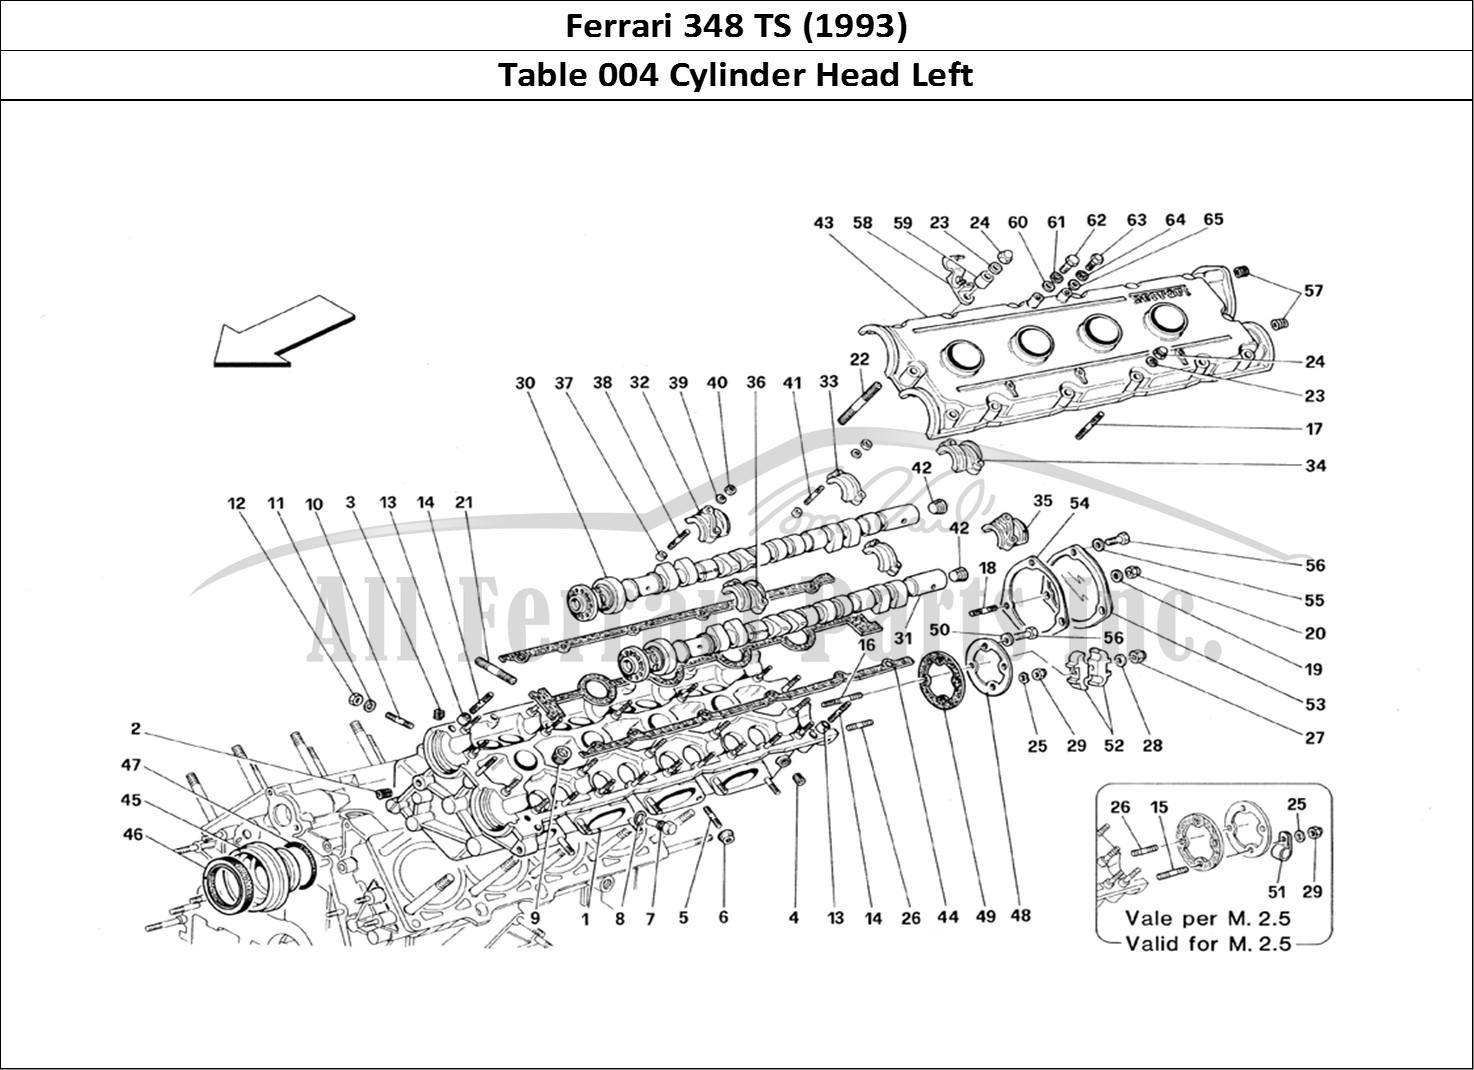 Buy original Ferrari 348 TS (1993) 004 Cylinder Head Left